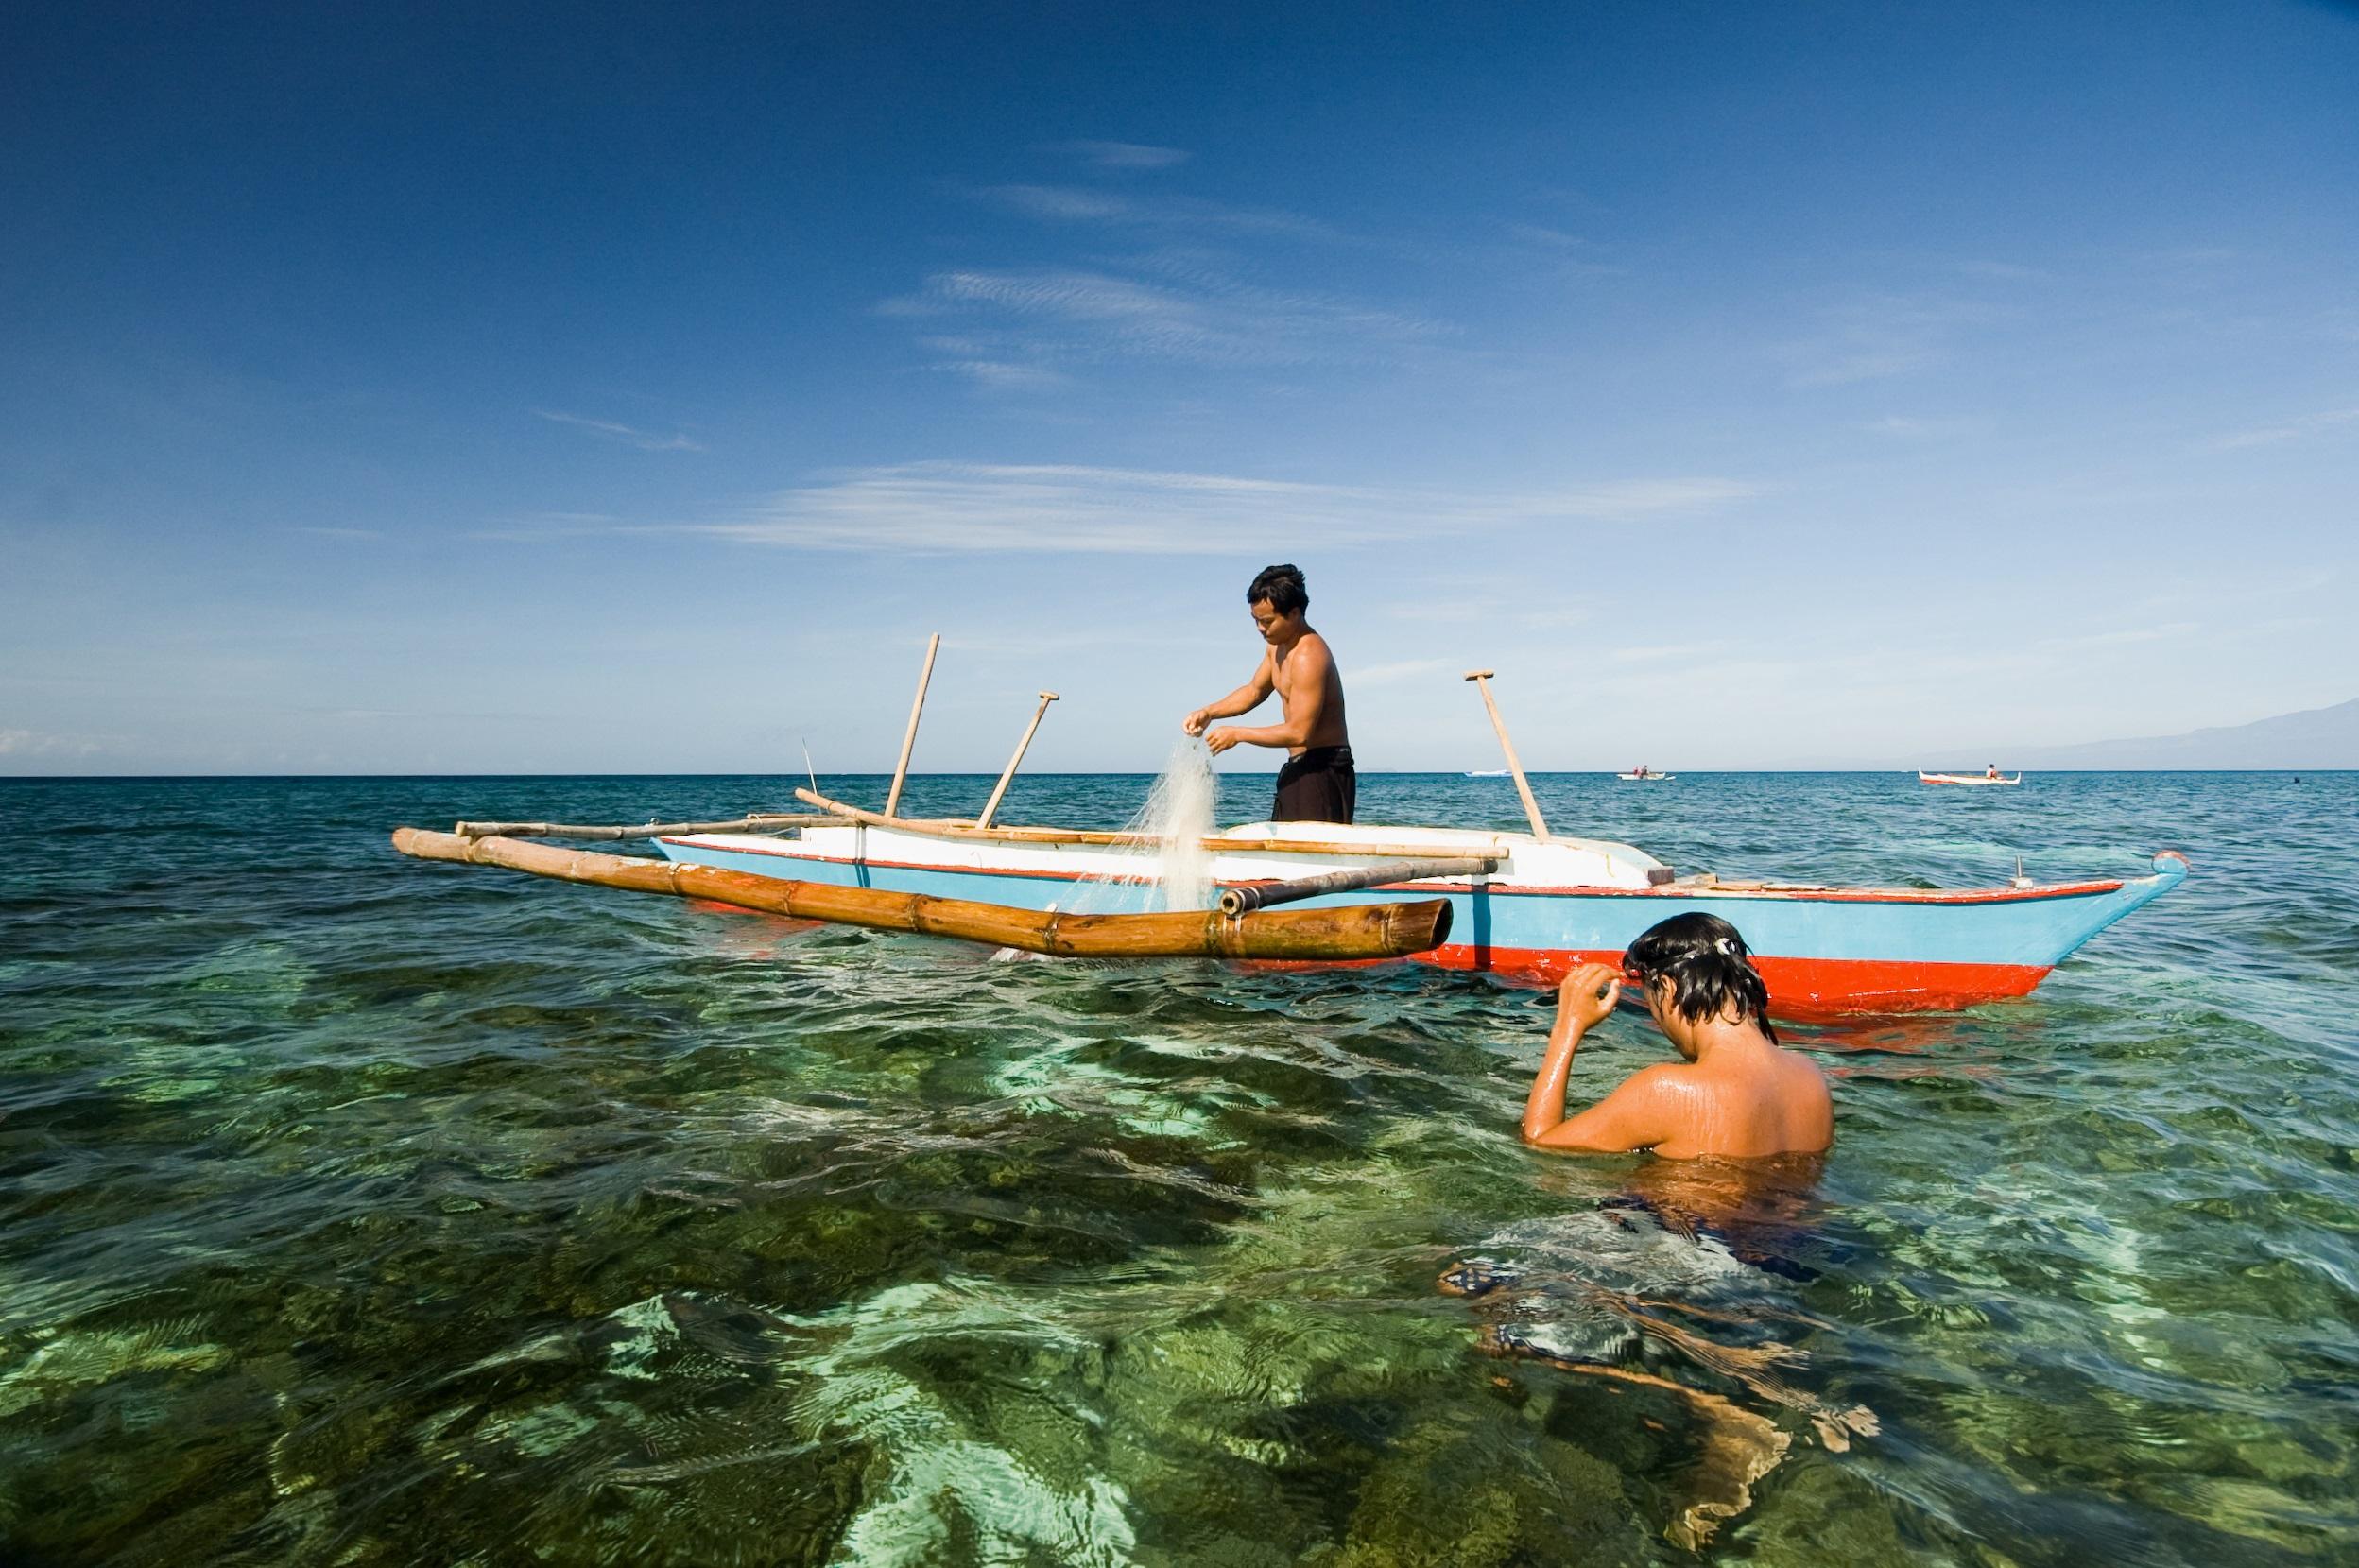 small-scale-reef-fishermen-philippines_rebecca weeks-grida (1)